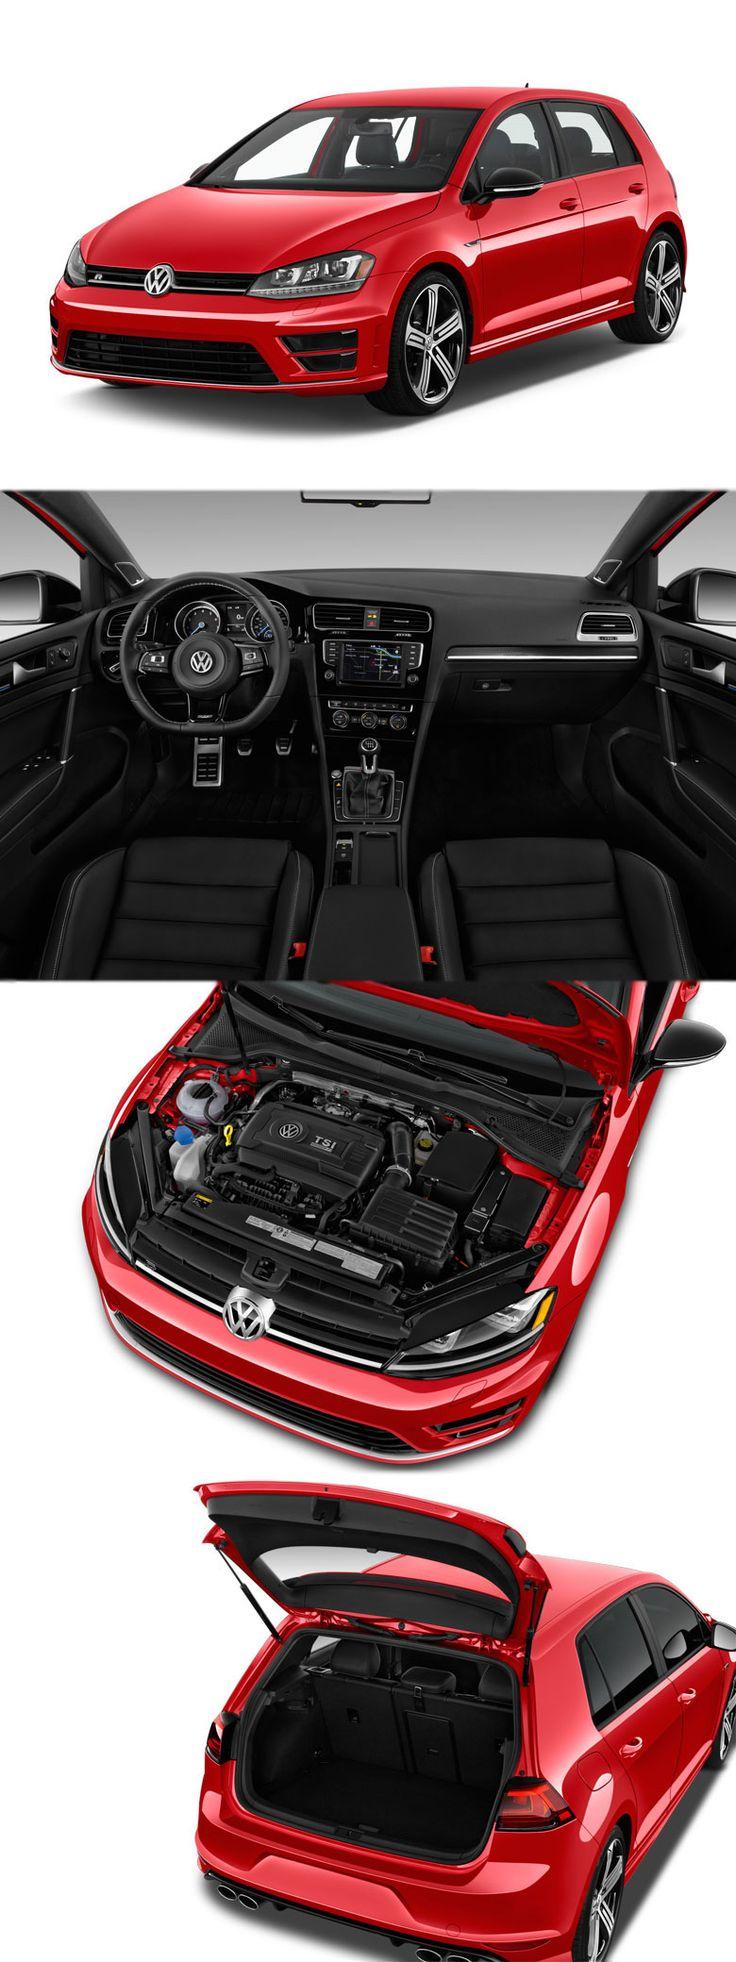 The New VW Golf, An Outstanding Hatchback https://www.enginefitters.co.uk/blog/volkswagen-golf-gti-clubsport-s-inspired-porsche-911-gt3/